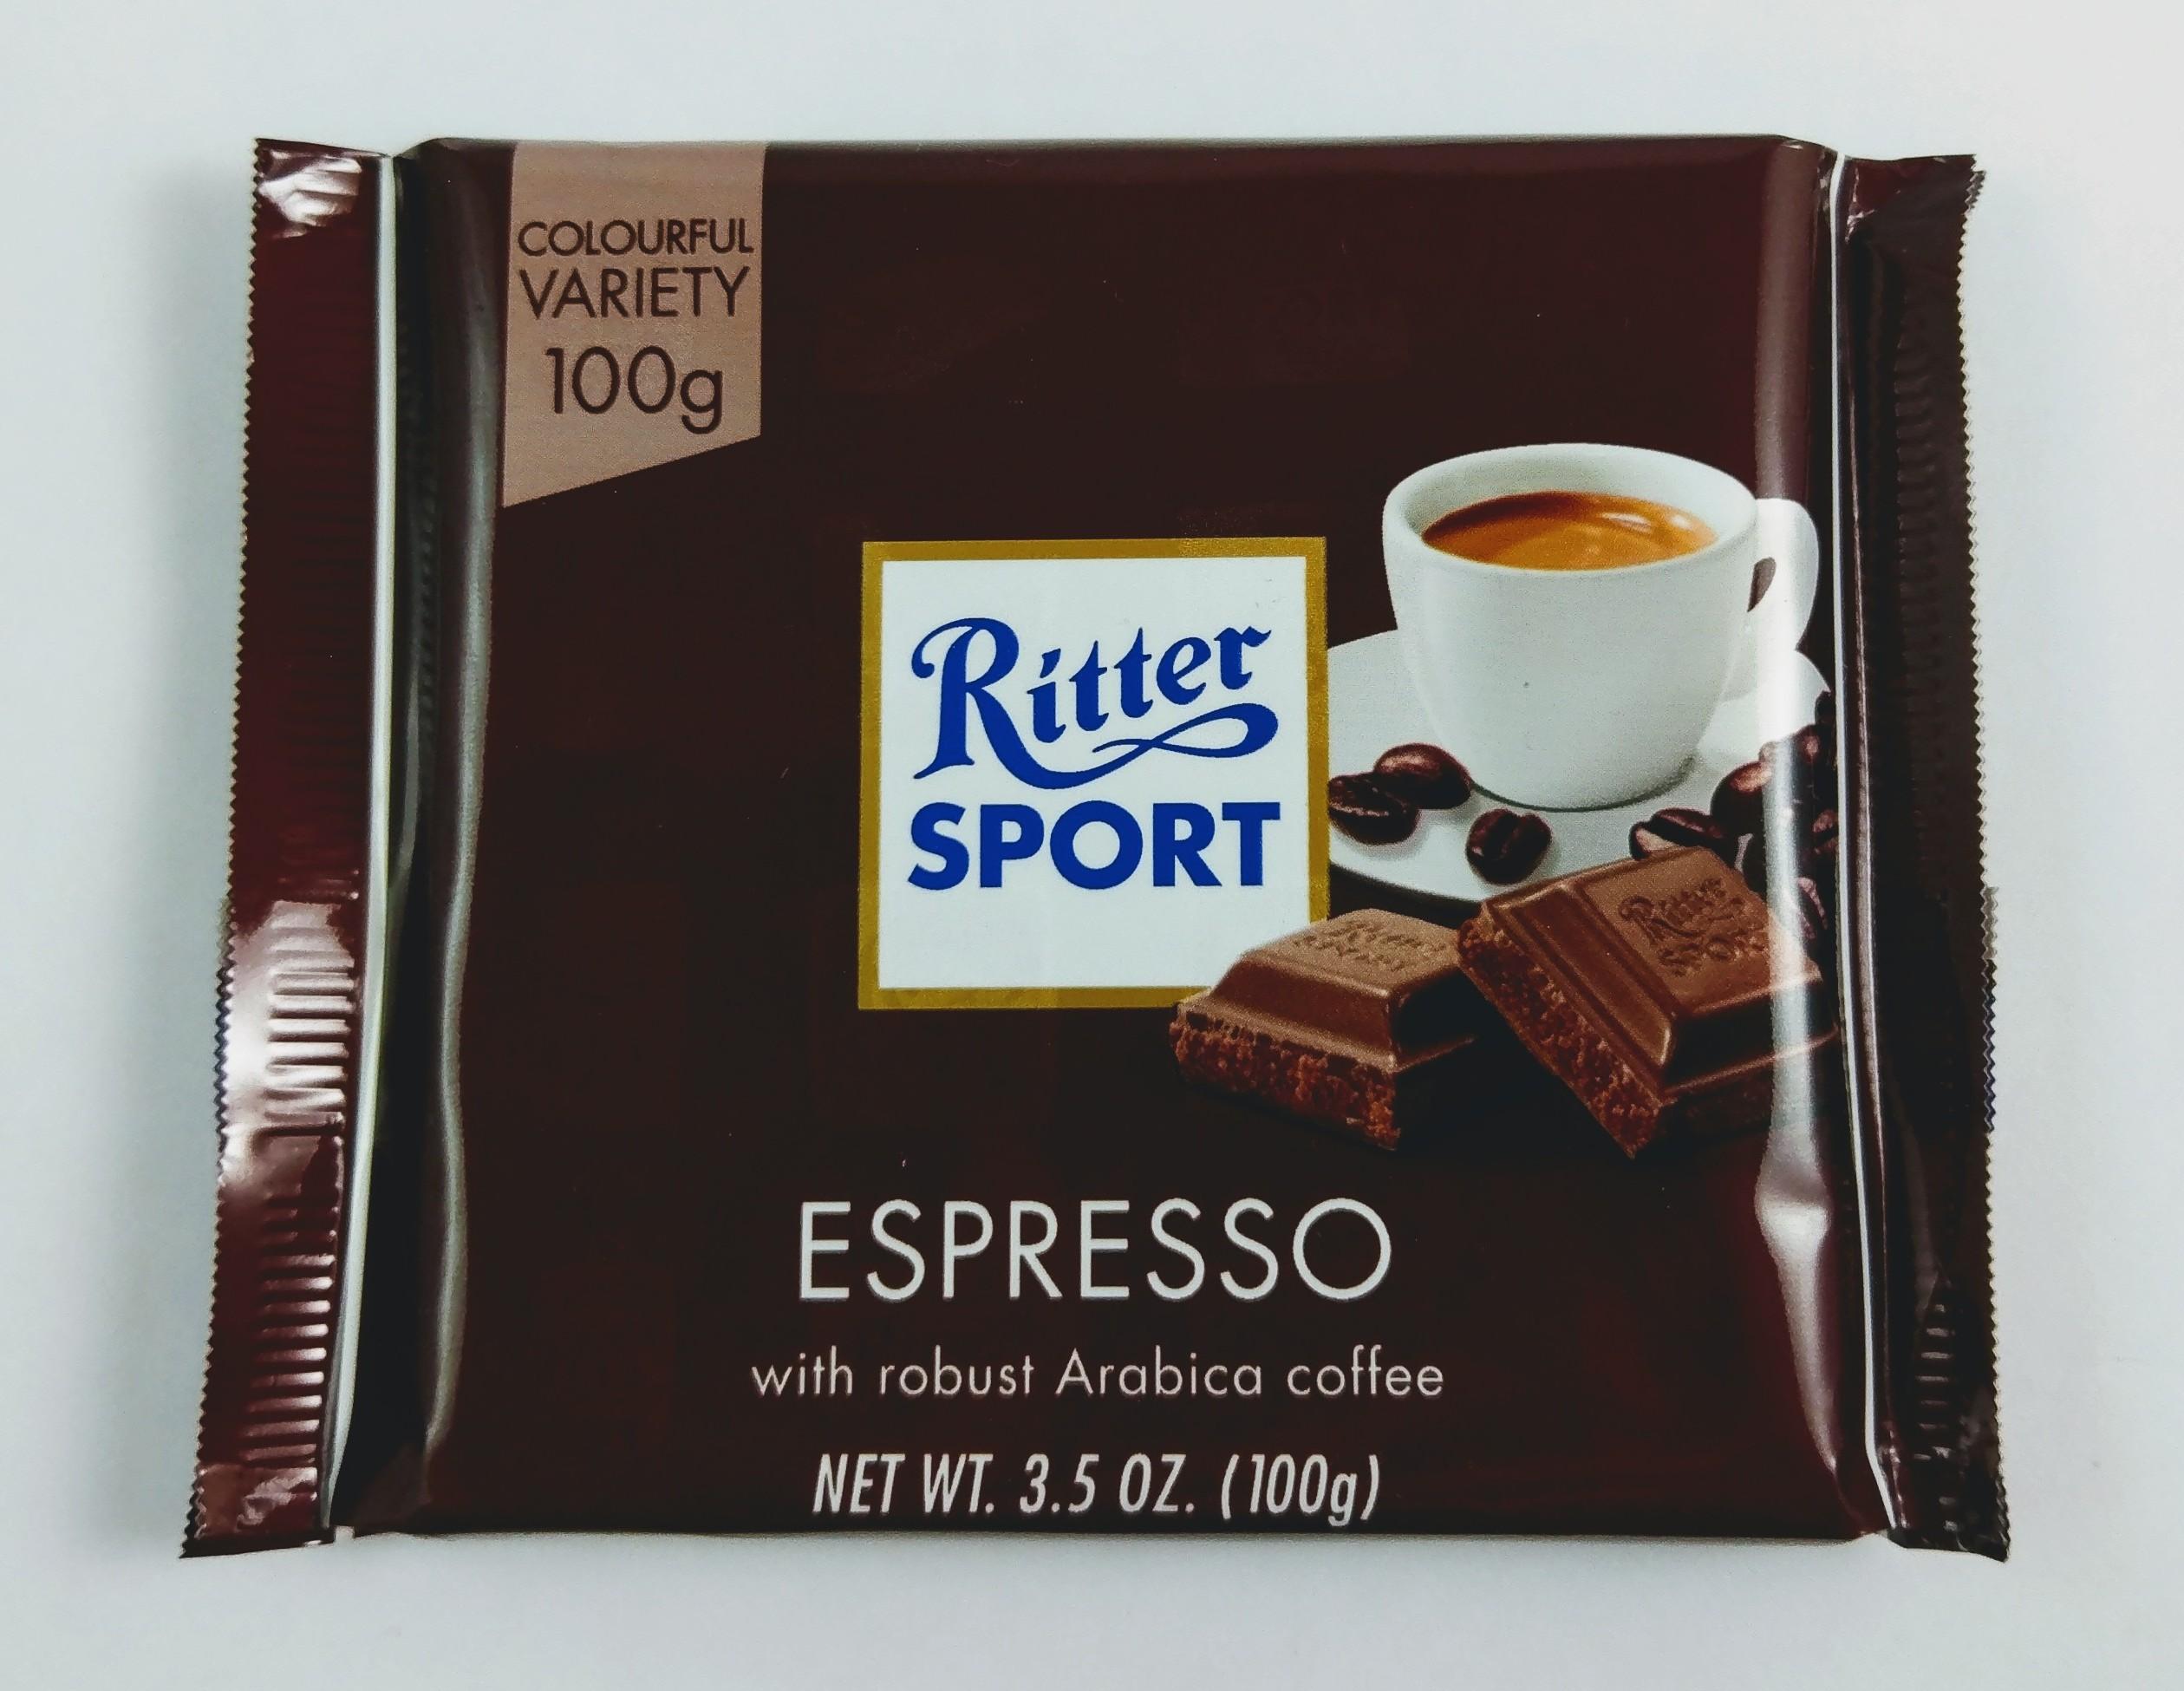 Ritter Sport Espresso chocolate bar